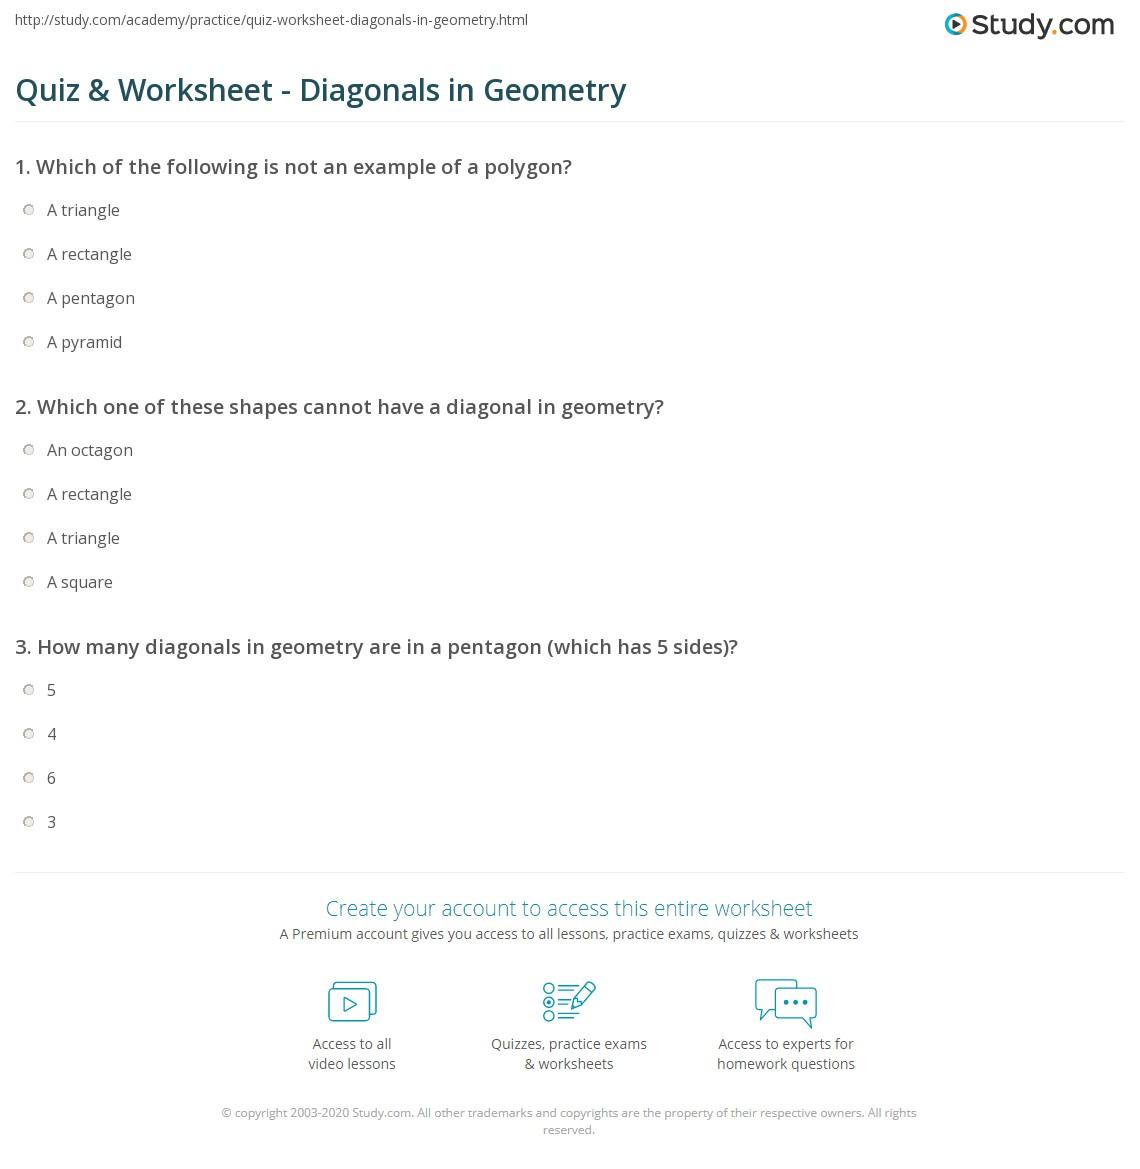 quiz worksheet diagonals in geometry. Black Bedroom Furniture Sets. Home Design Ideas